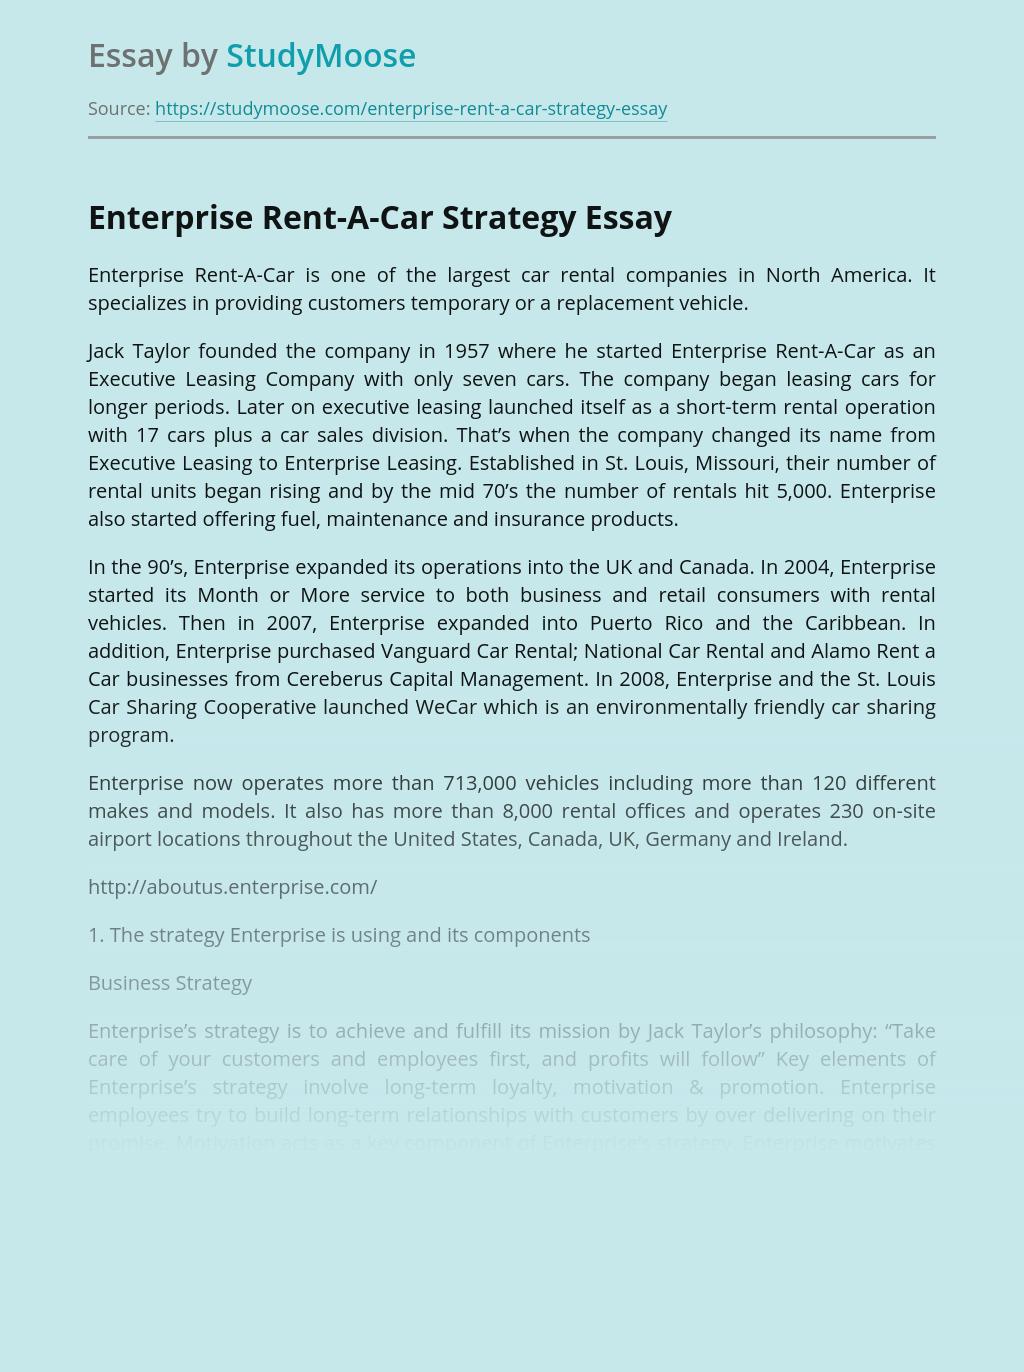 Enterprise Rent-A-Car Strategy